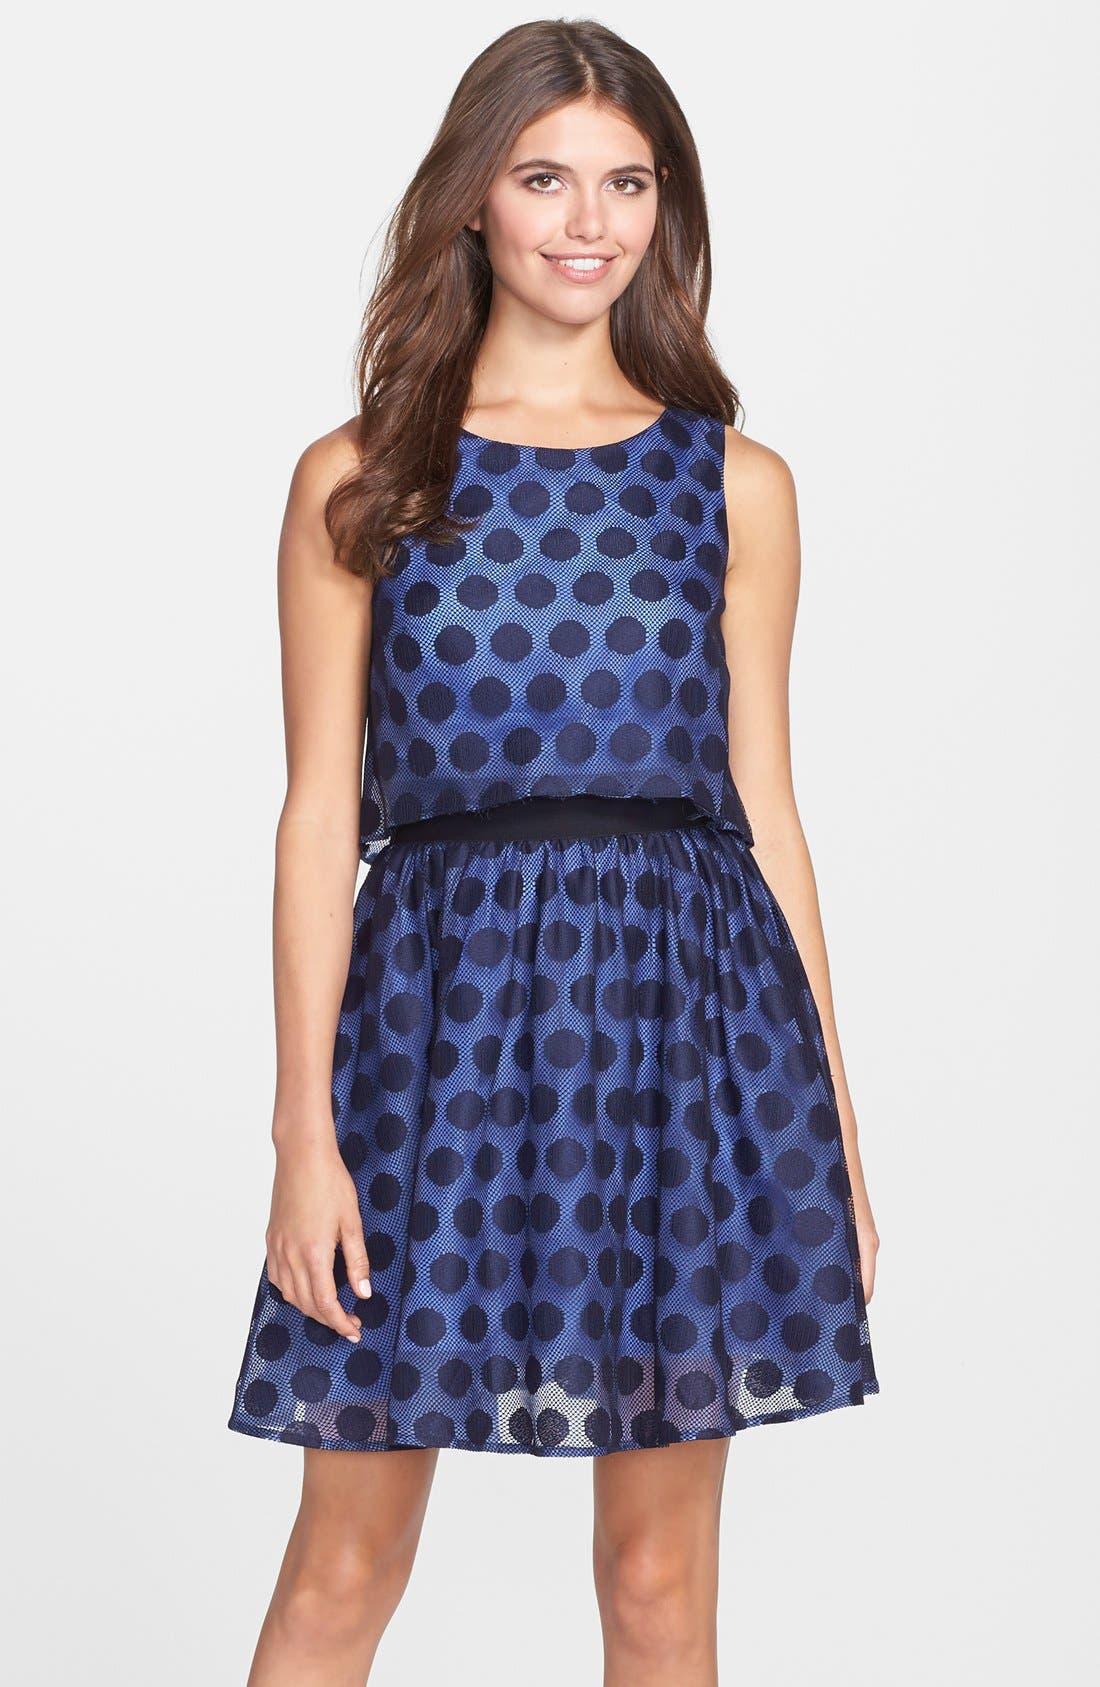 Alternate Image 1 Selected - Betsey Johnson Dot Print Lace Pop Over Dress